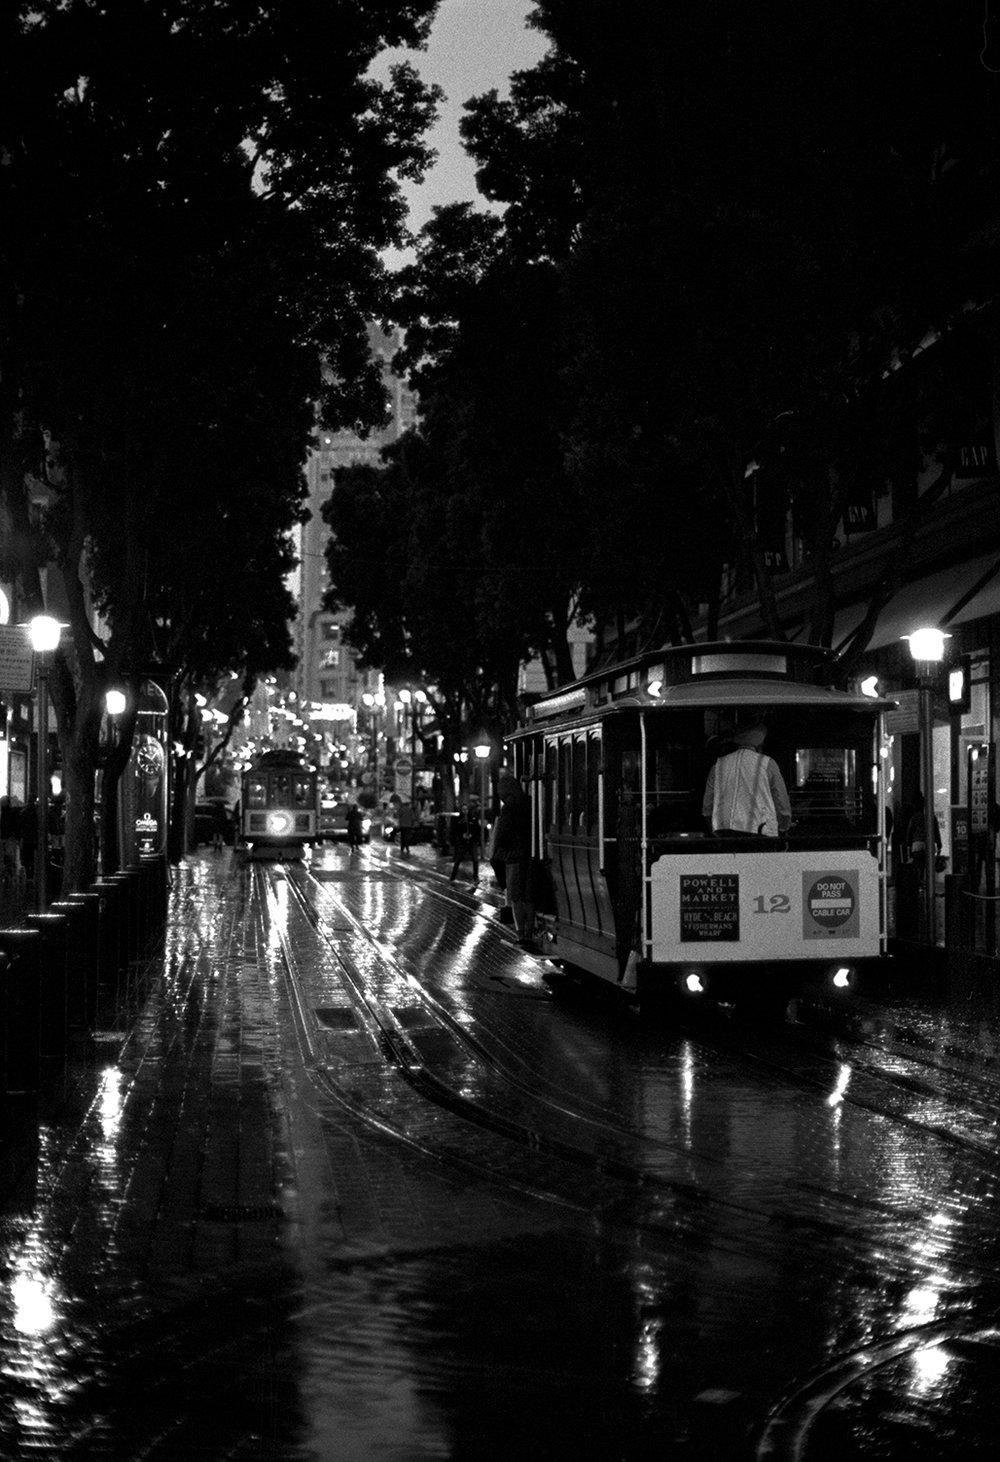 streetcar1-small.jpg